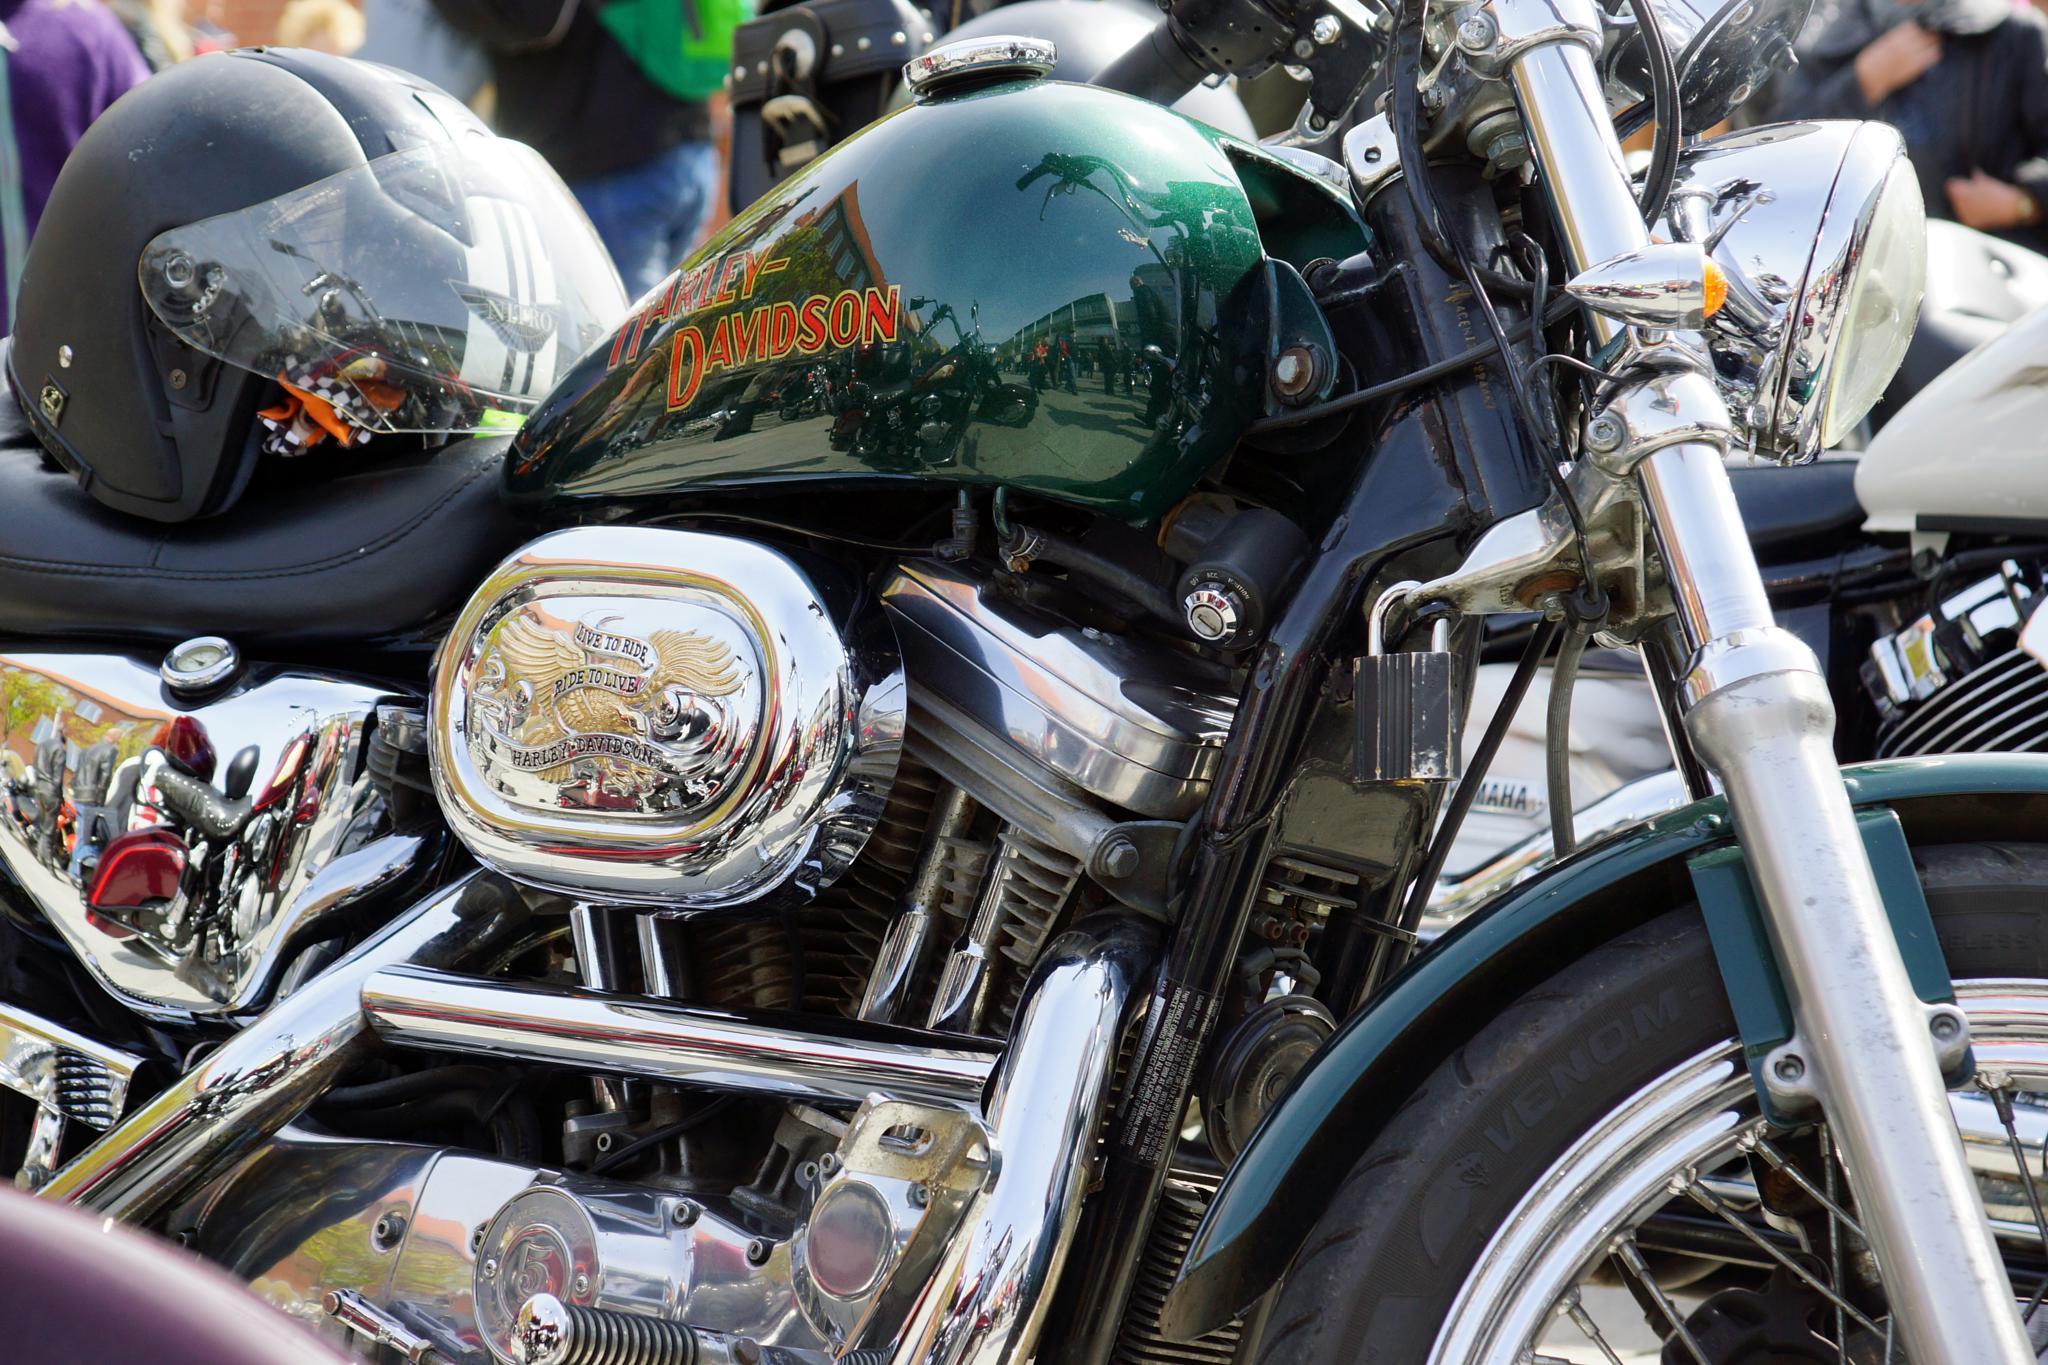 Harley Davidson by PoulErikVistoftNielsen